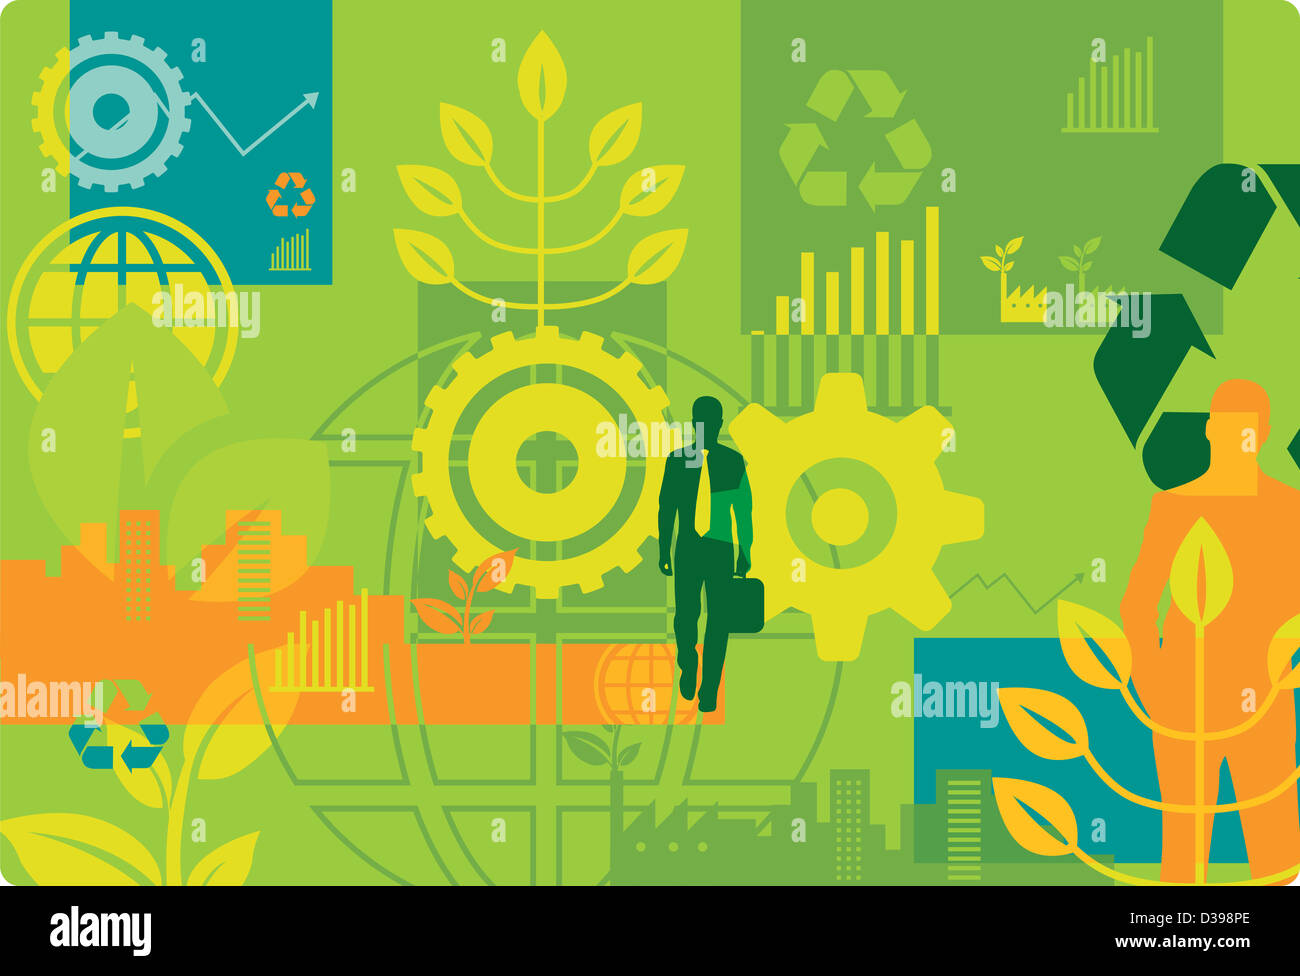 Imagen ilustrativa de go Green concepto Imagen De Stock